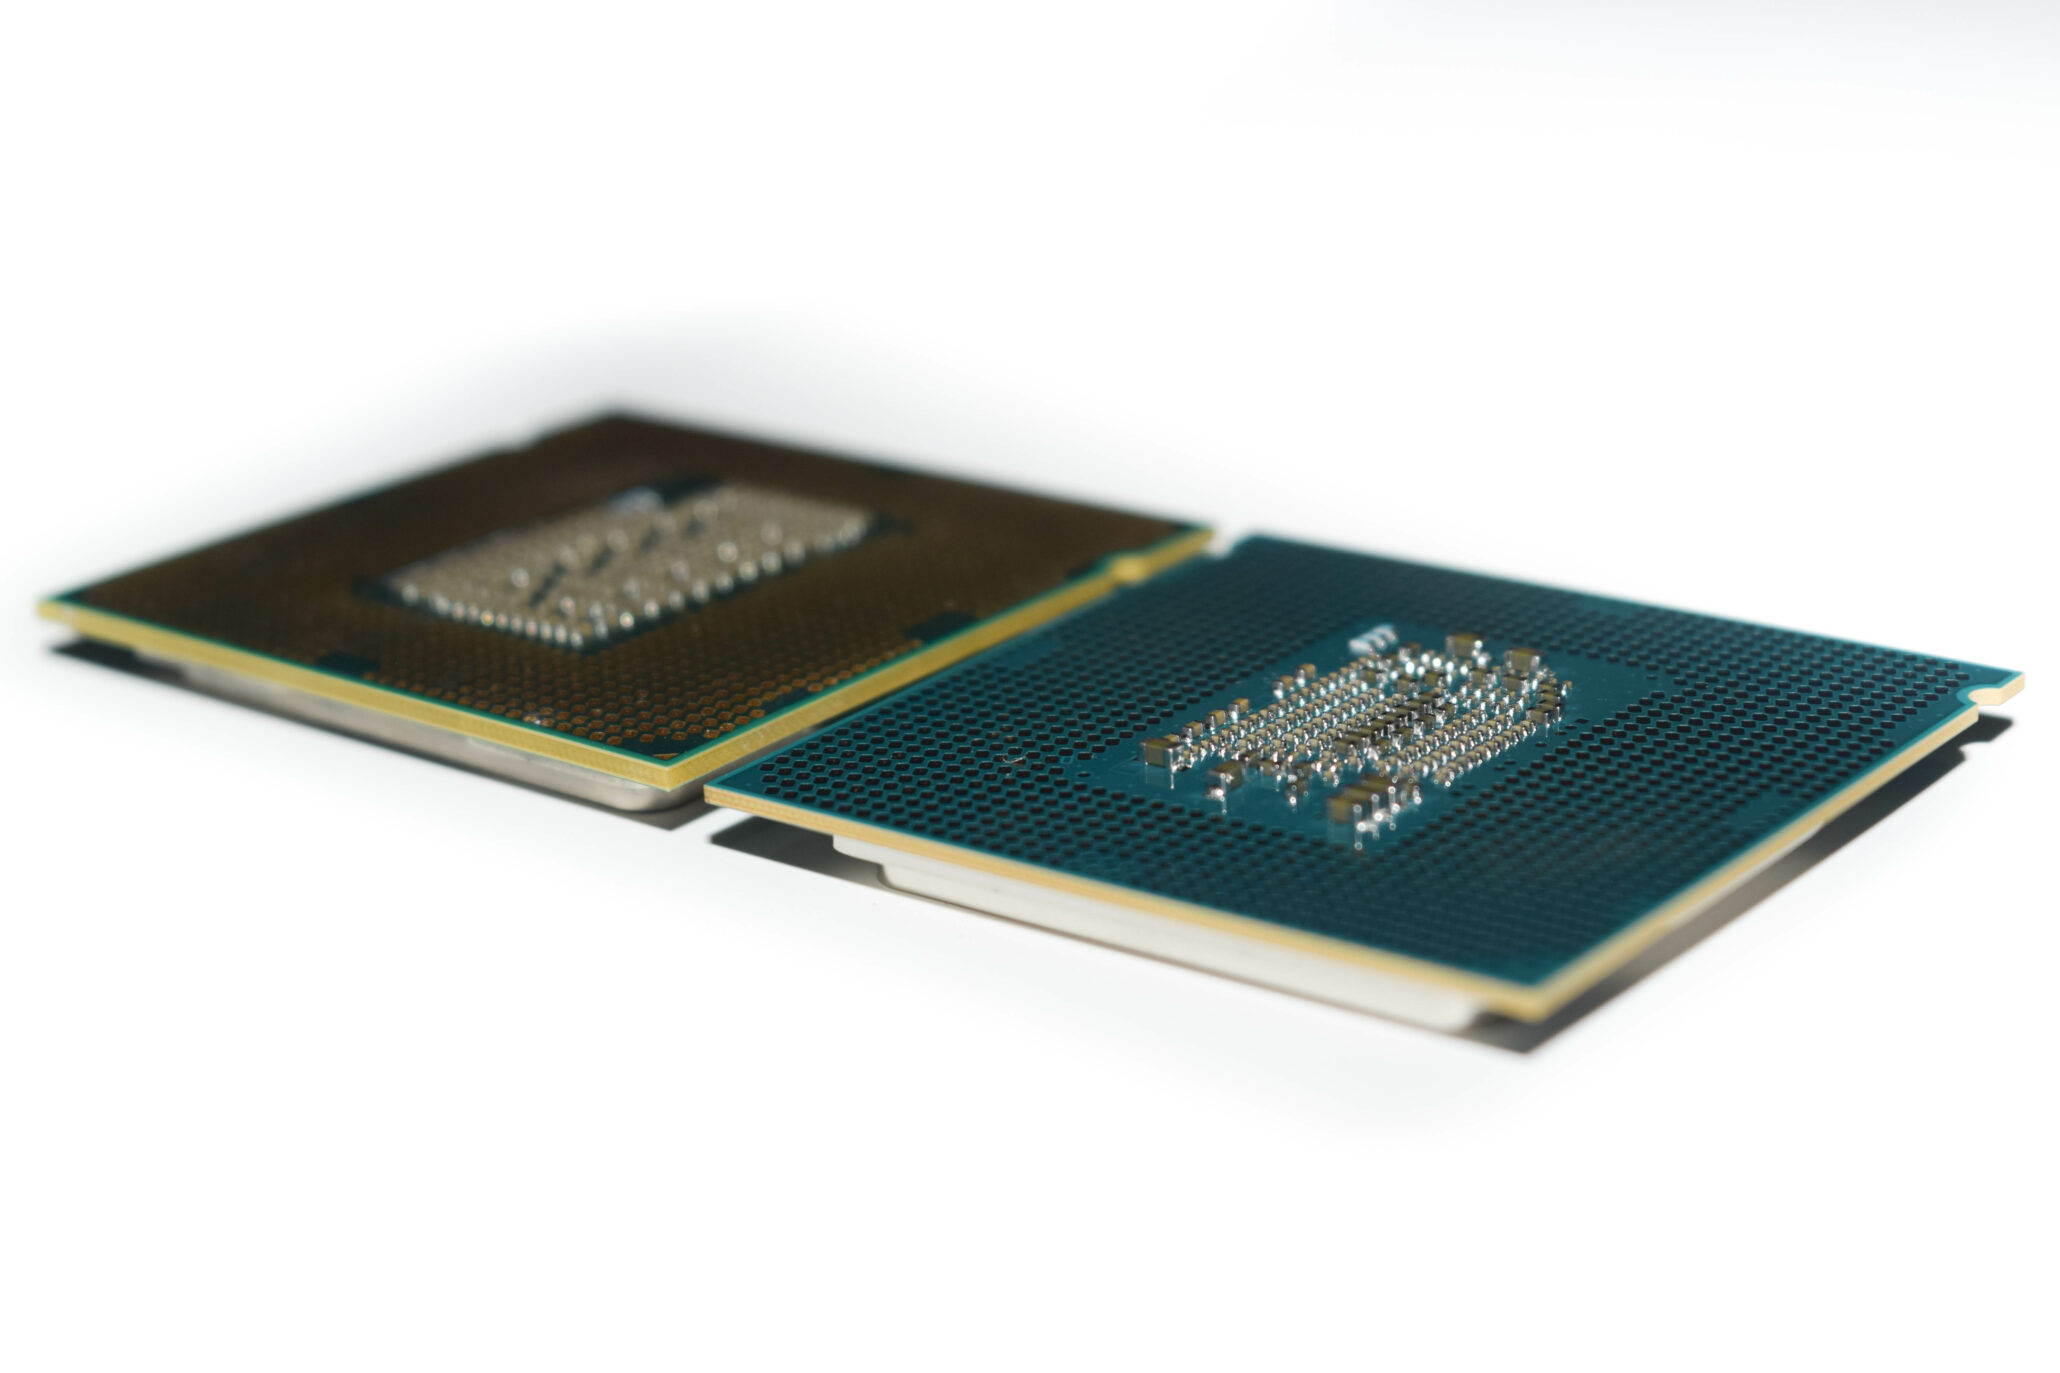 intel-core-i7-6700k-processor_19